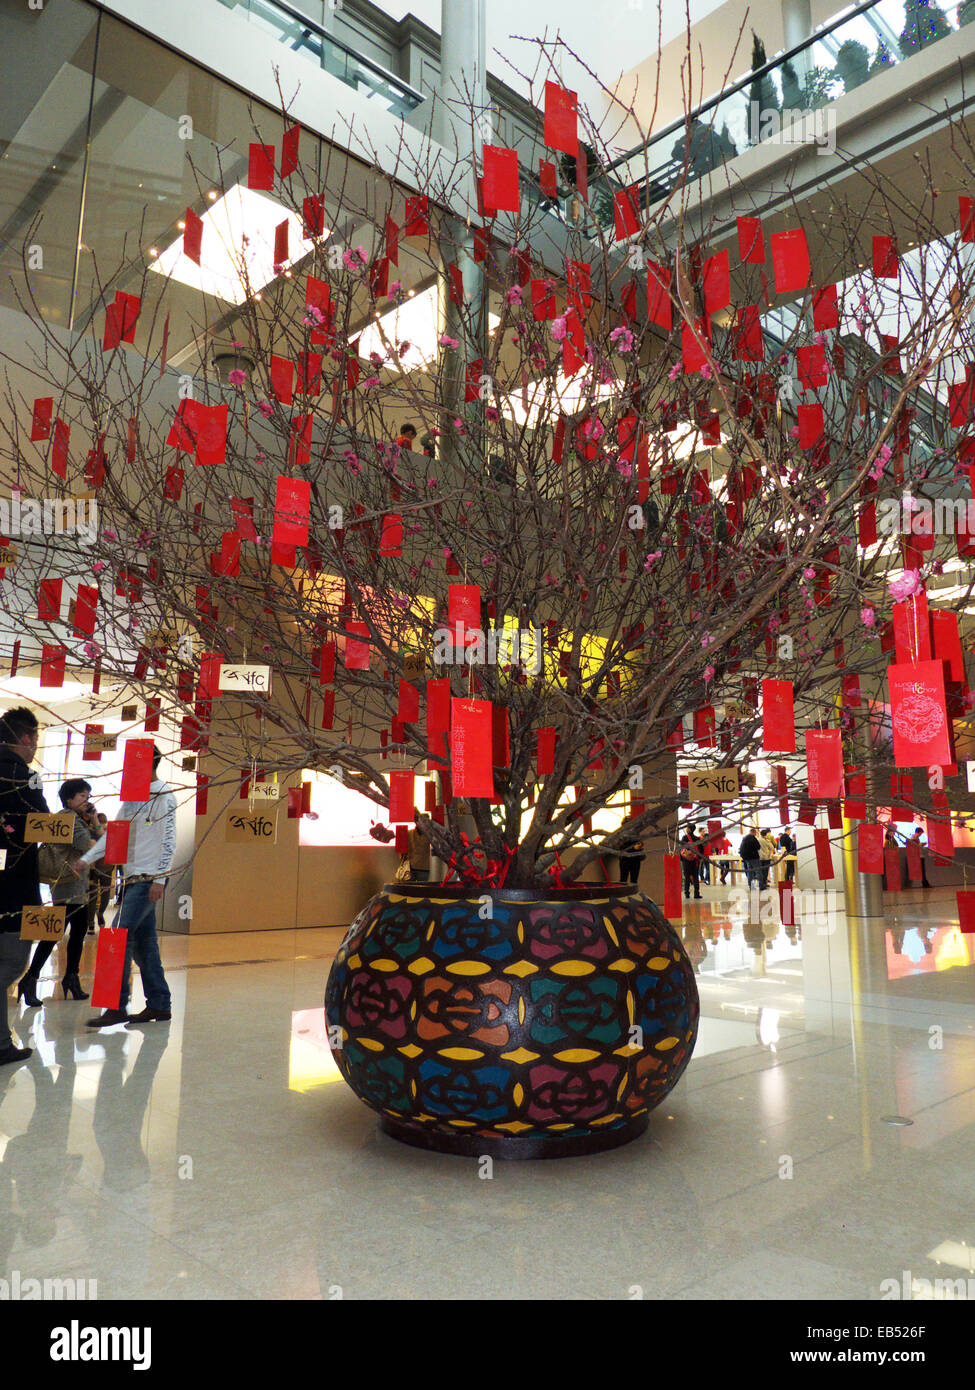 China Hong Kong Chinese Lunar New Year Decoration In Shopping Mall   Stock  Image